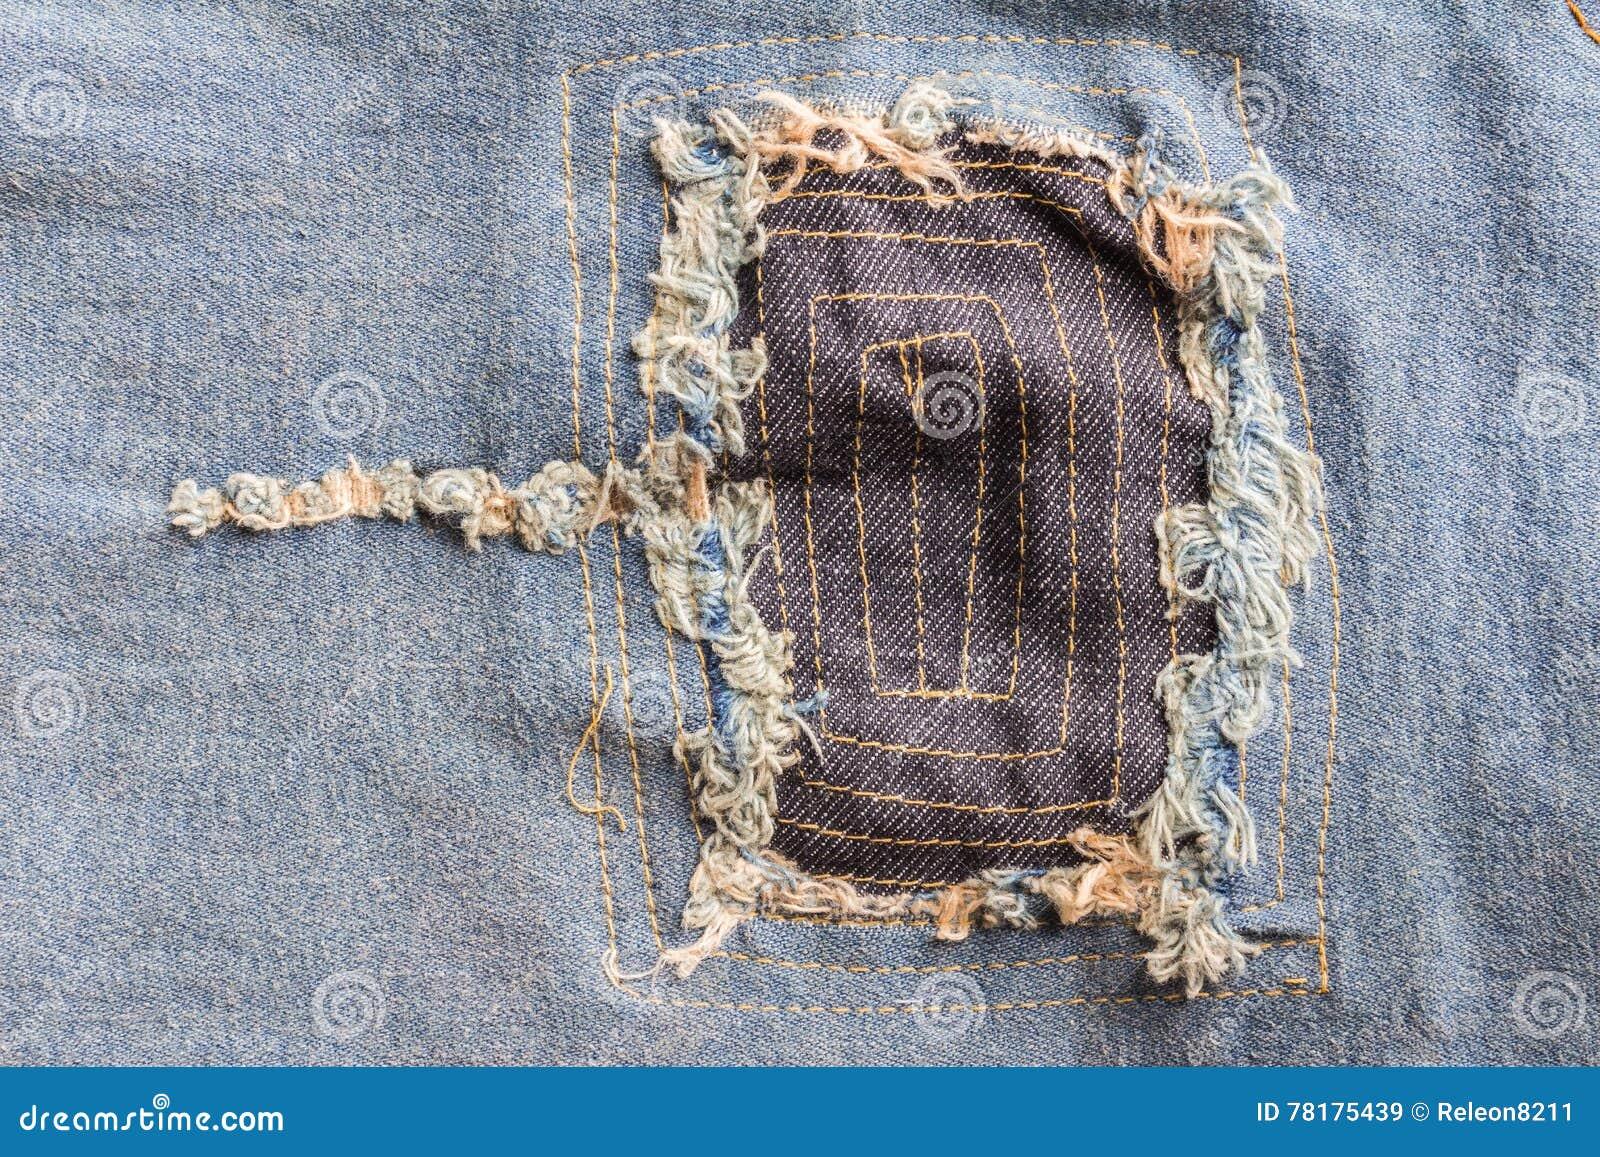 Torn denim clipart jeans texture